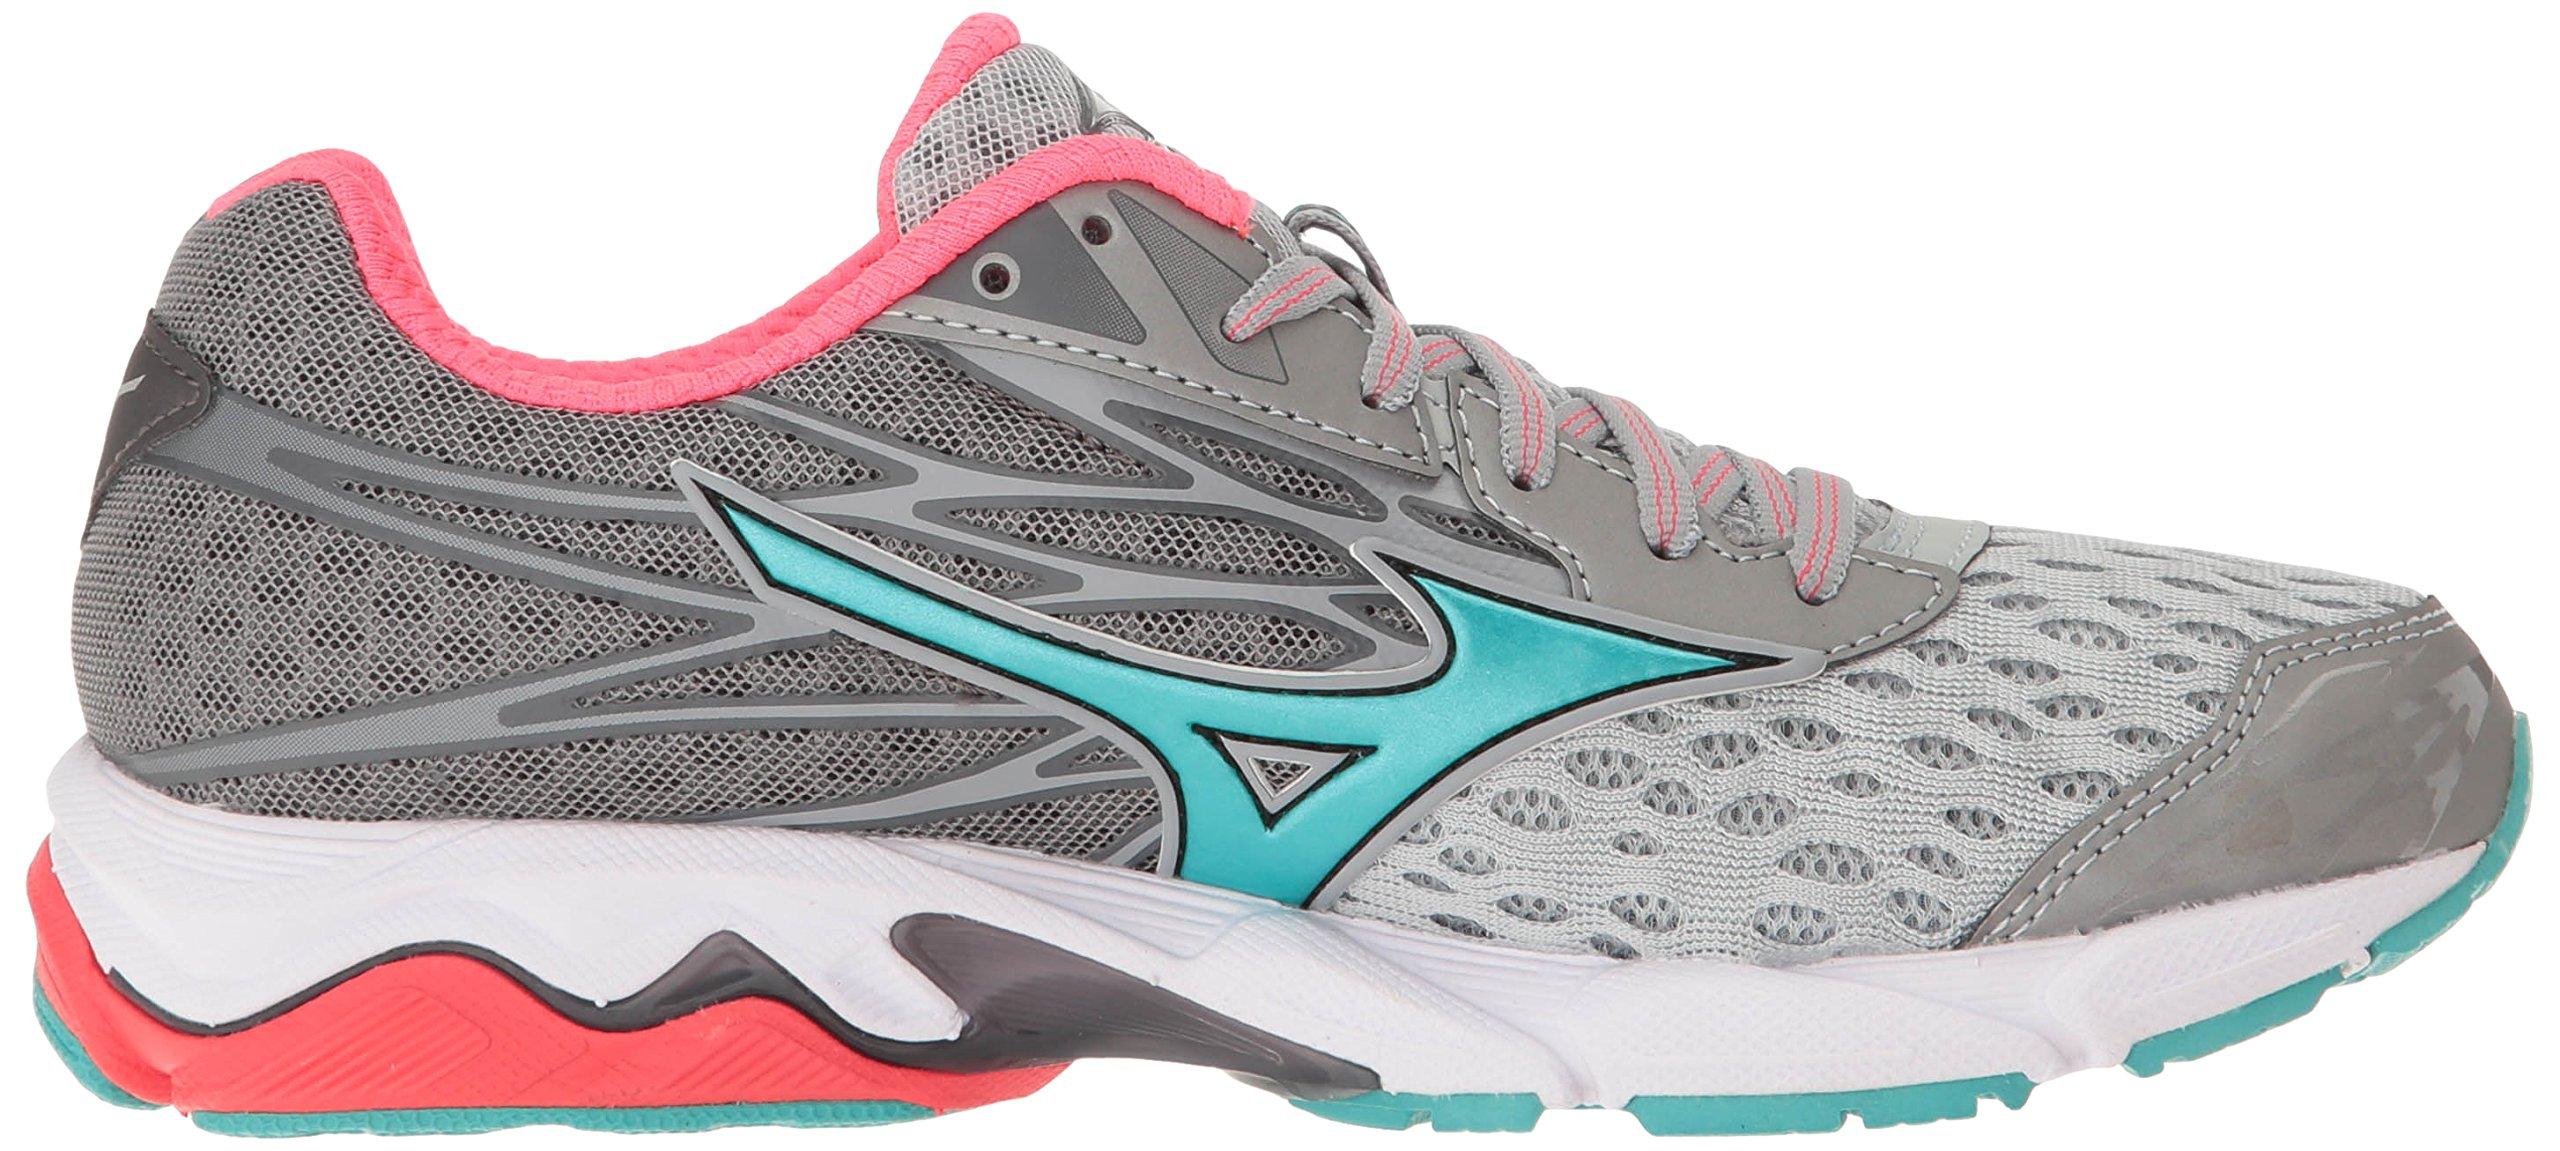 Mizuno Women's Wave Catalyst 2 Running Shoe, Grey/Mint, 9 B US by Mizuno (Image #7)